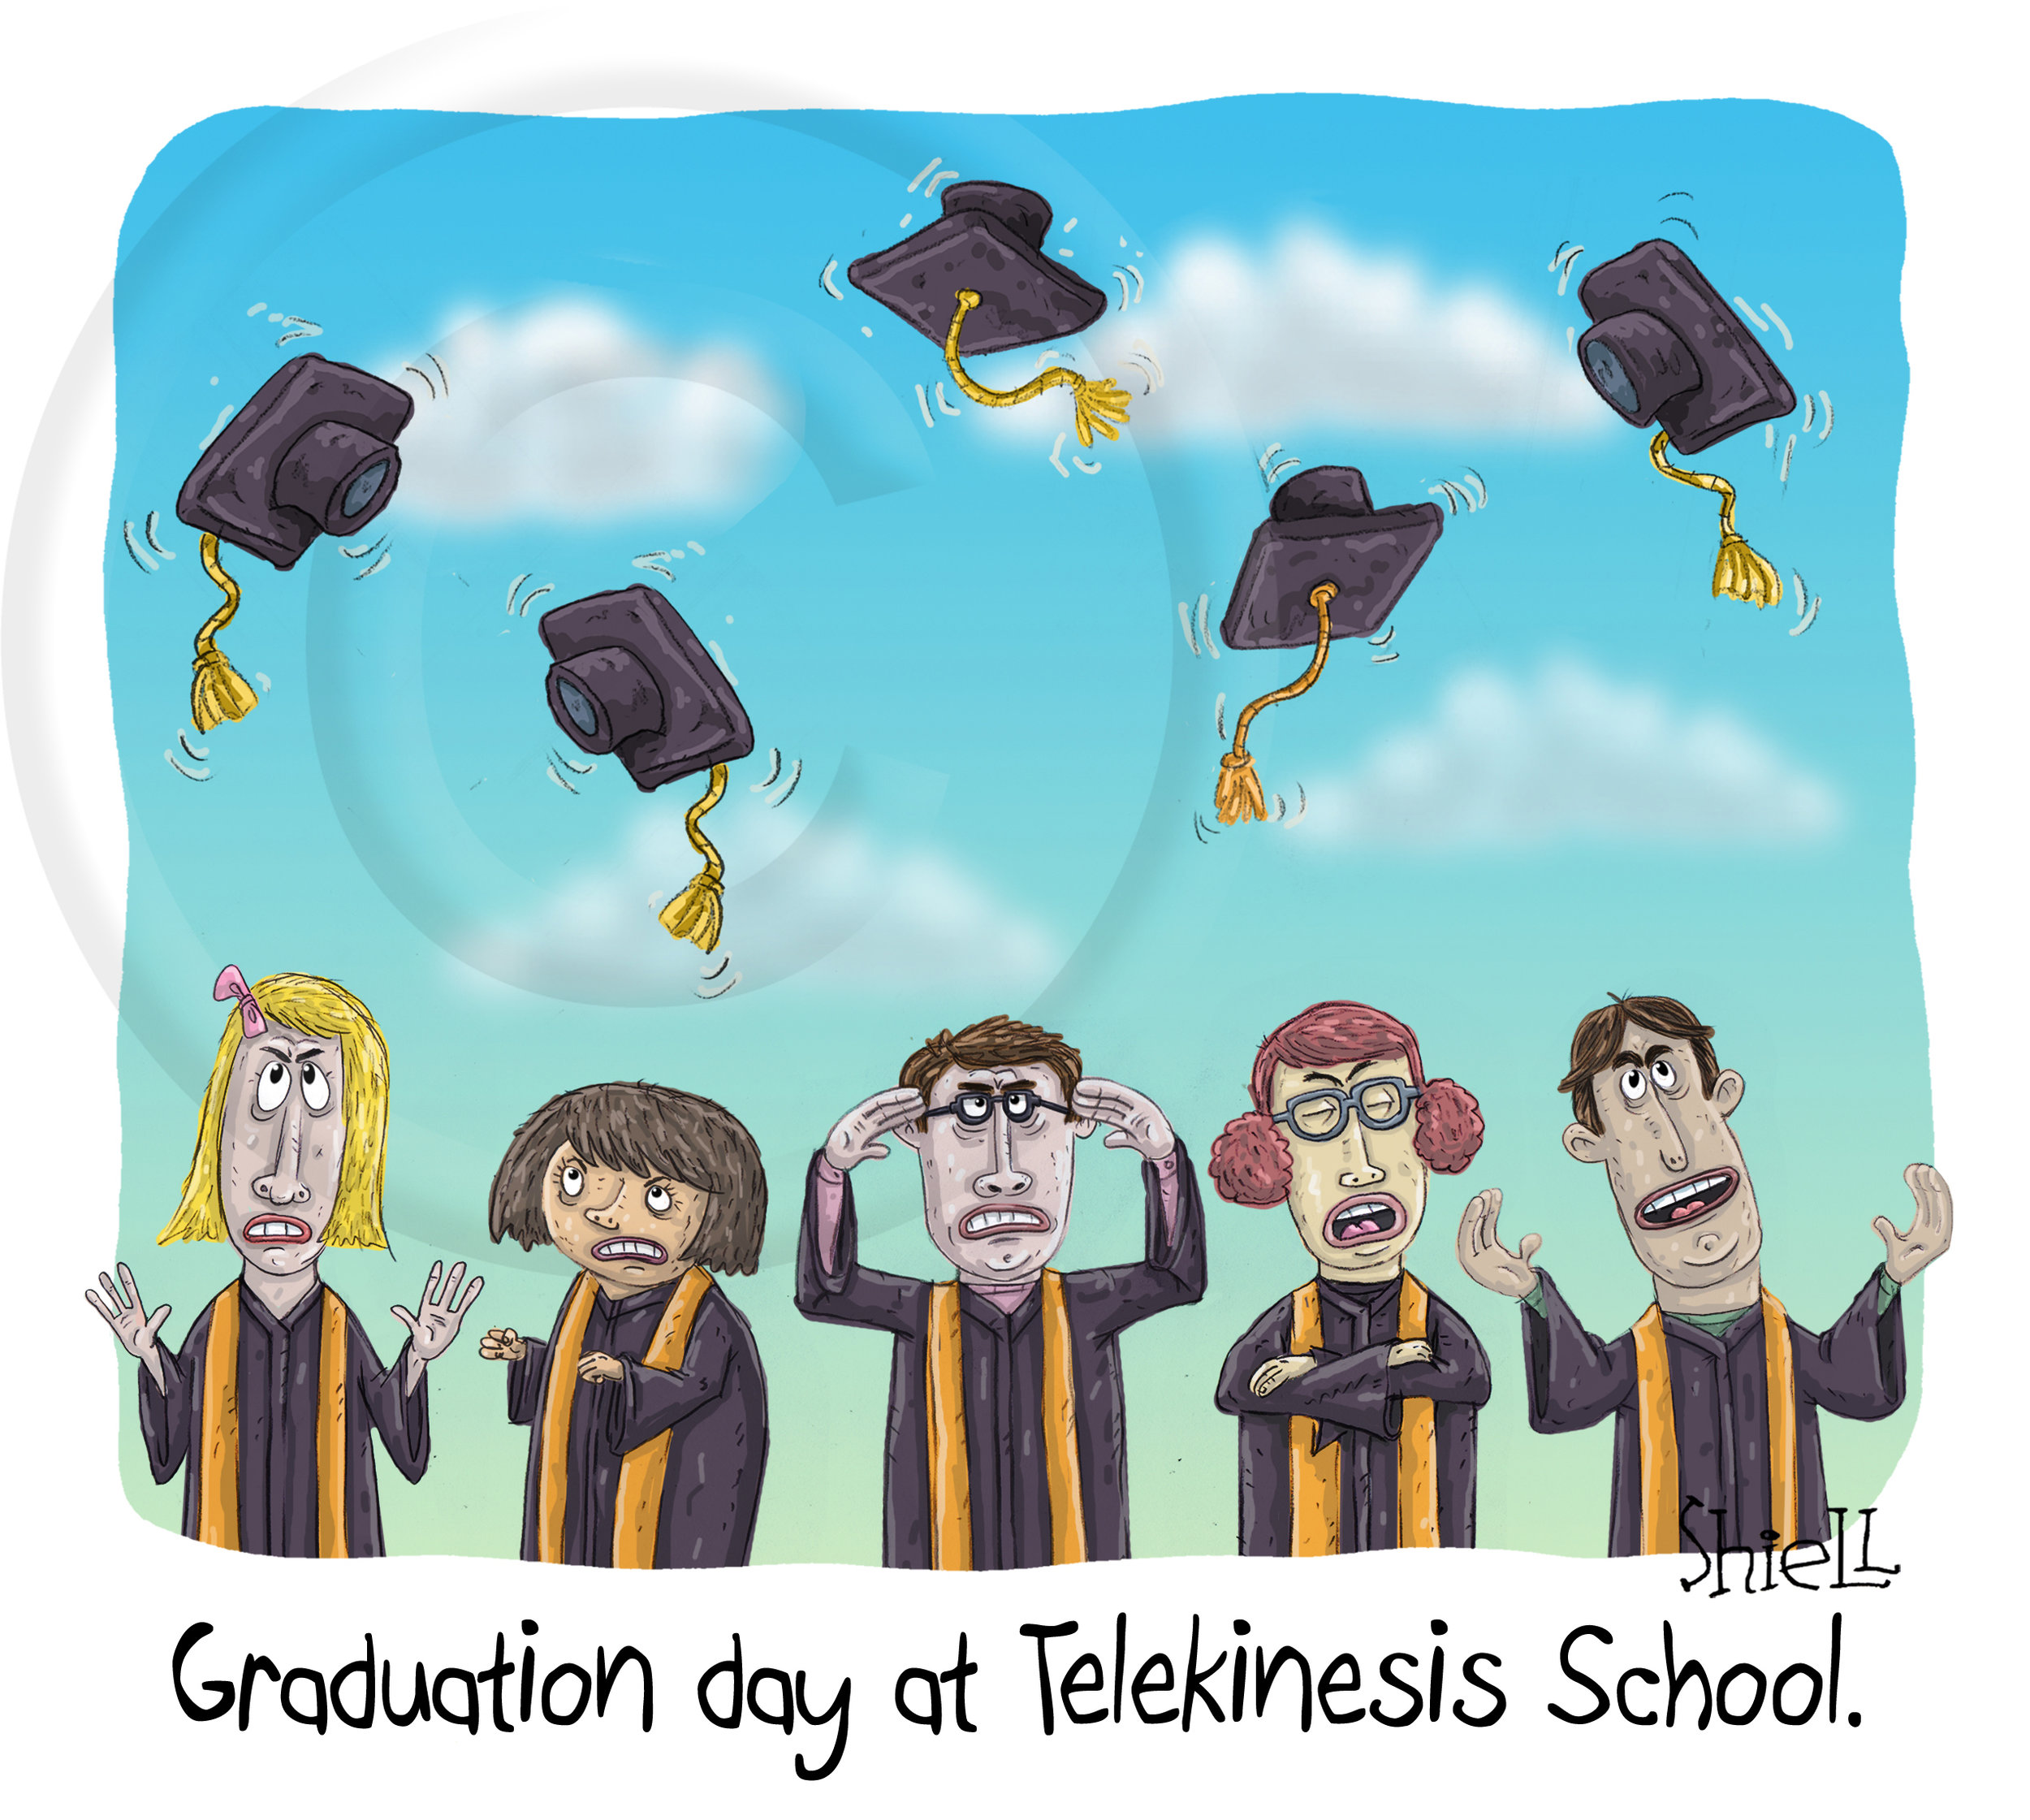 WMMike_Shiell_Telekinesis_School.jpg